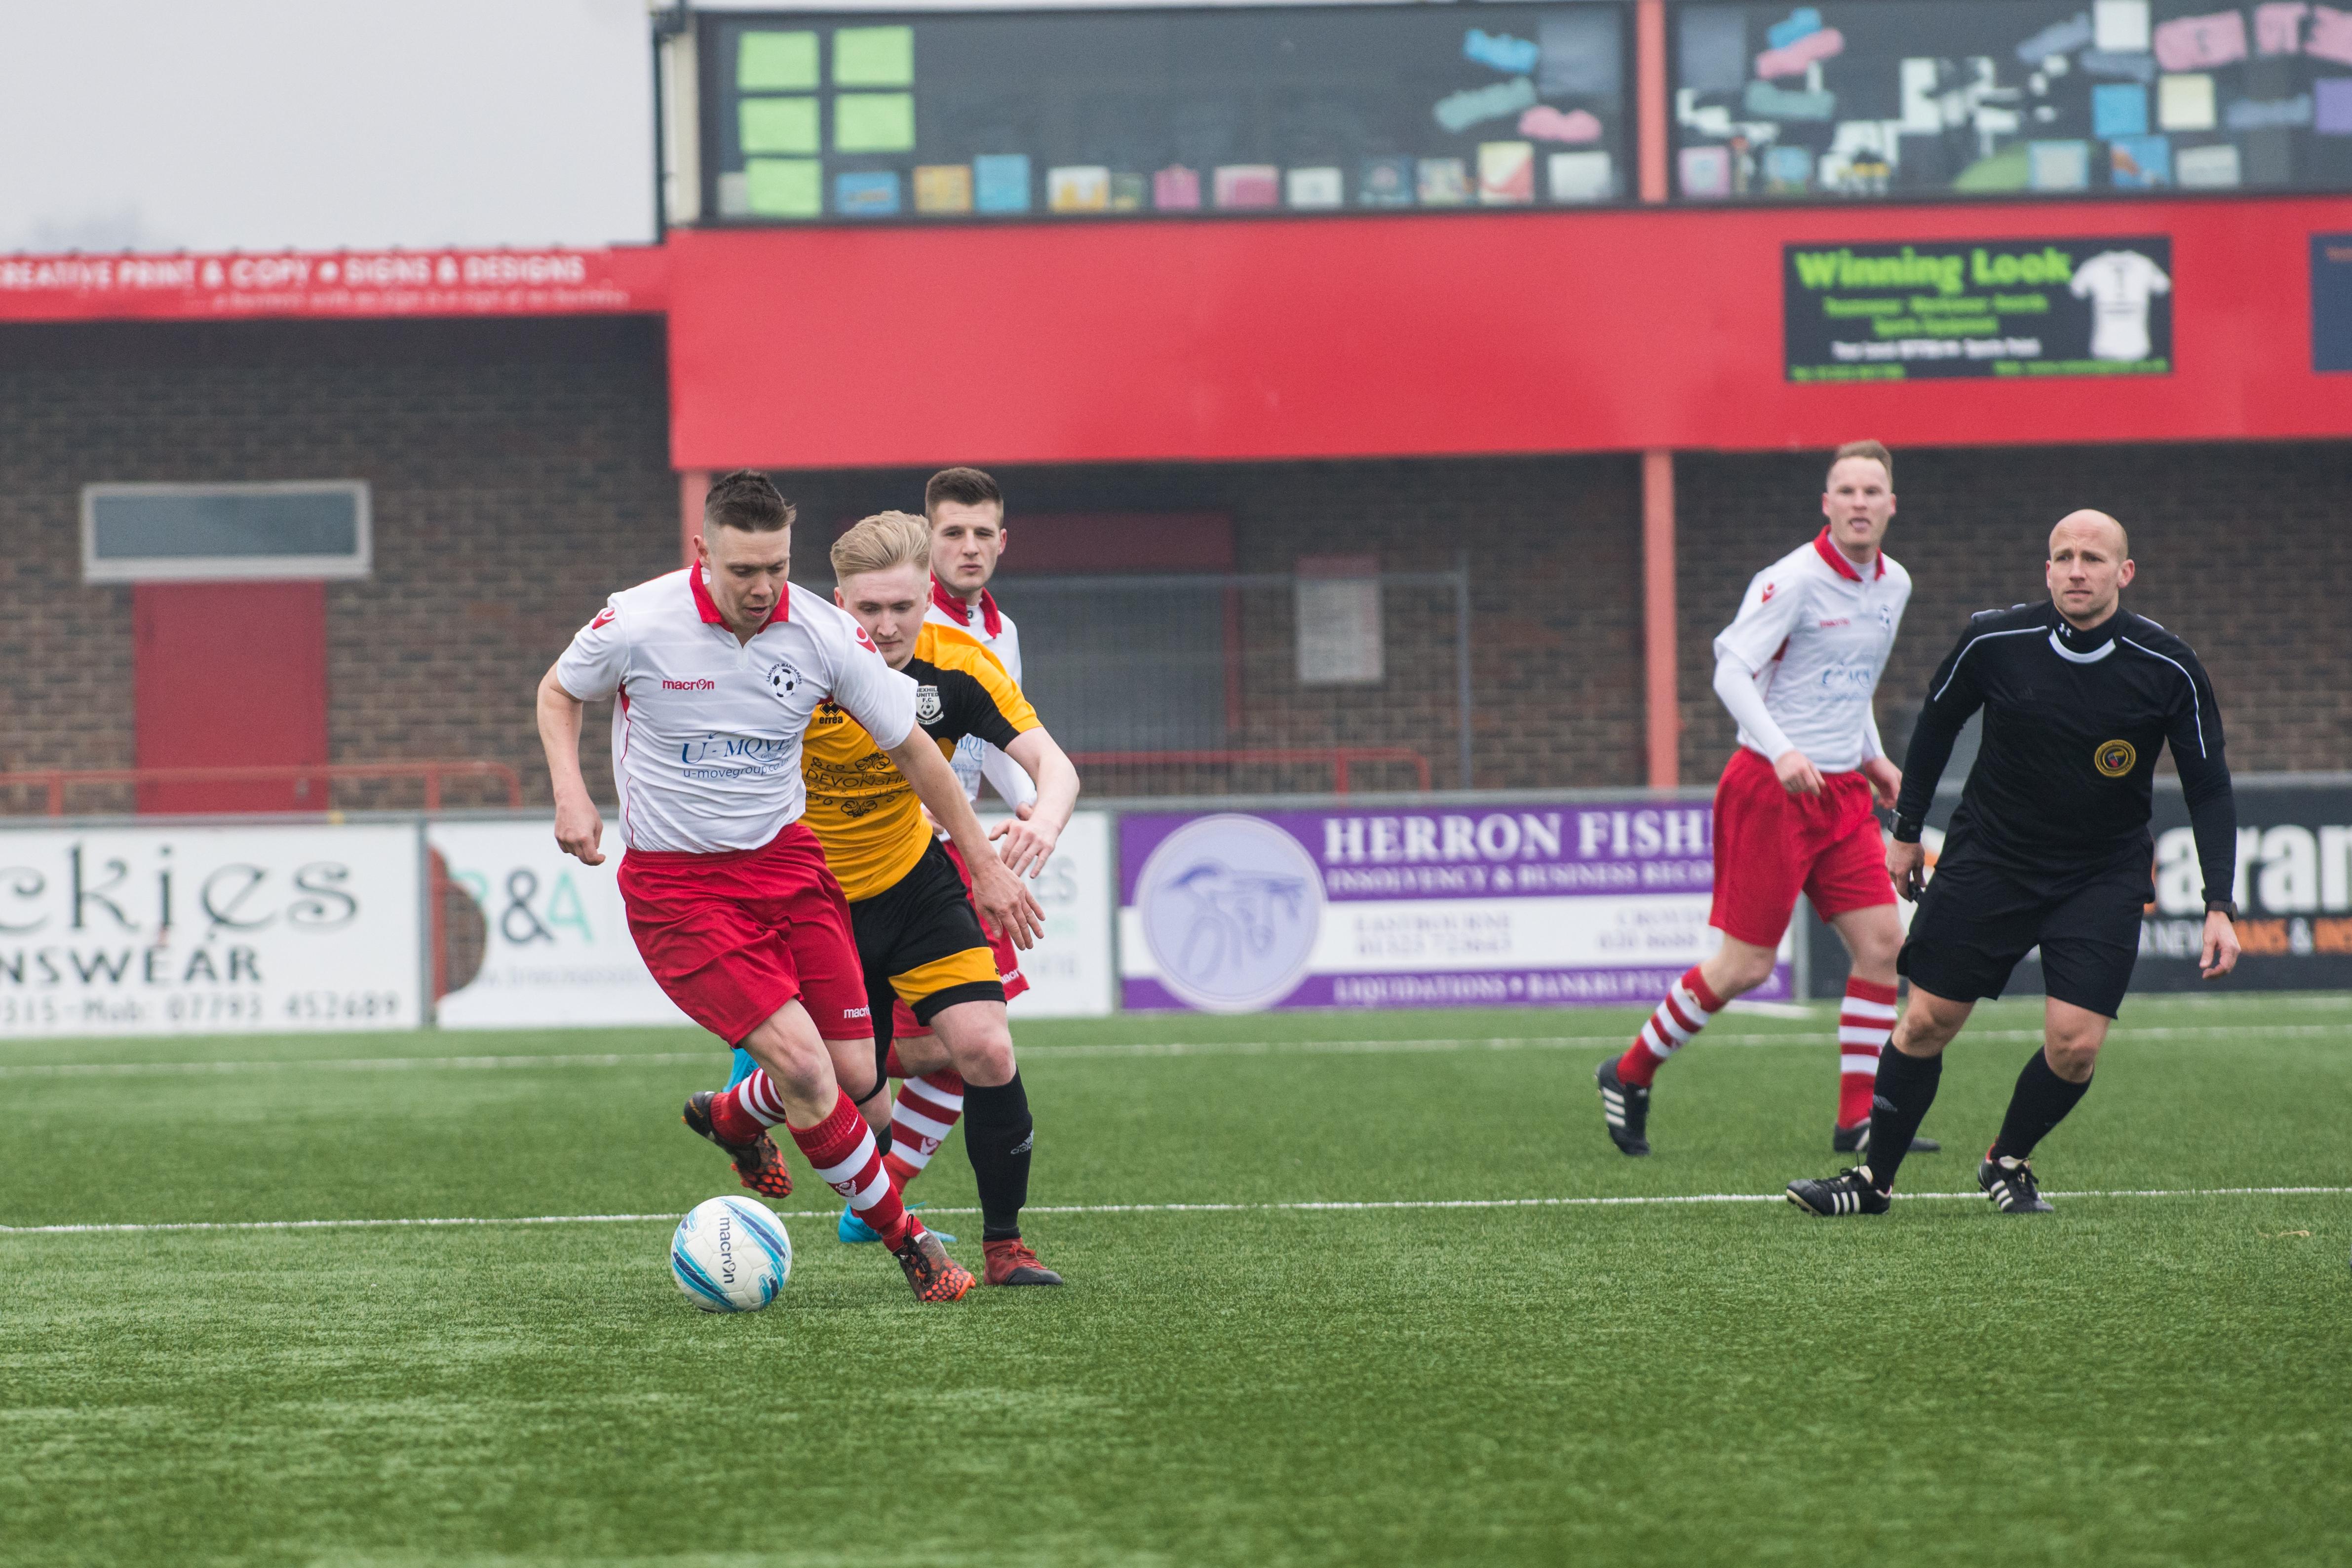 DAVID_JEFFERY Langney Wanderers FC vs Bexhill United FC 03.03.18 45